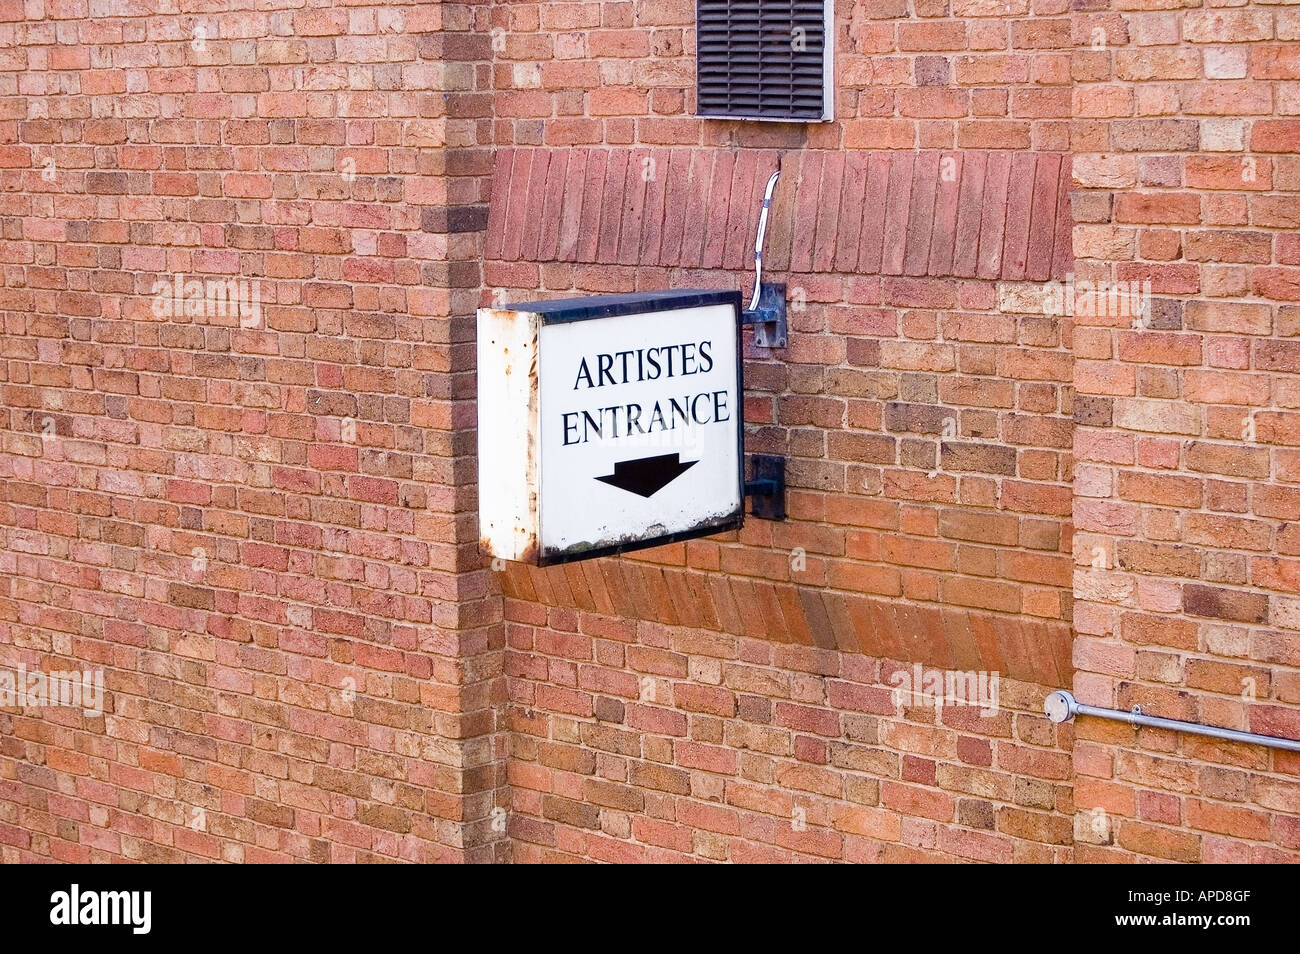 Artistes Entrance - Stock Image